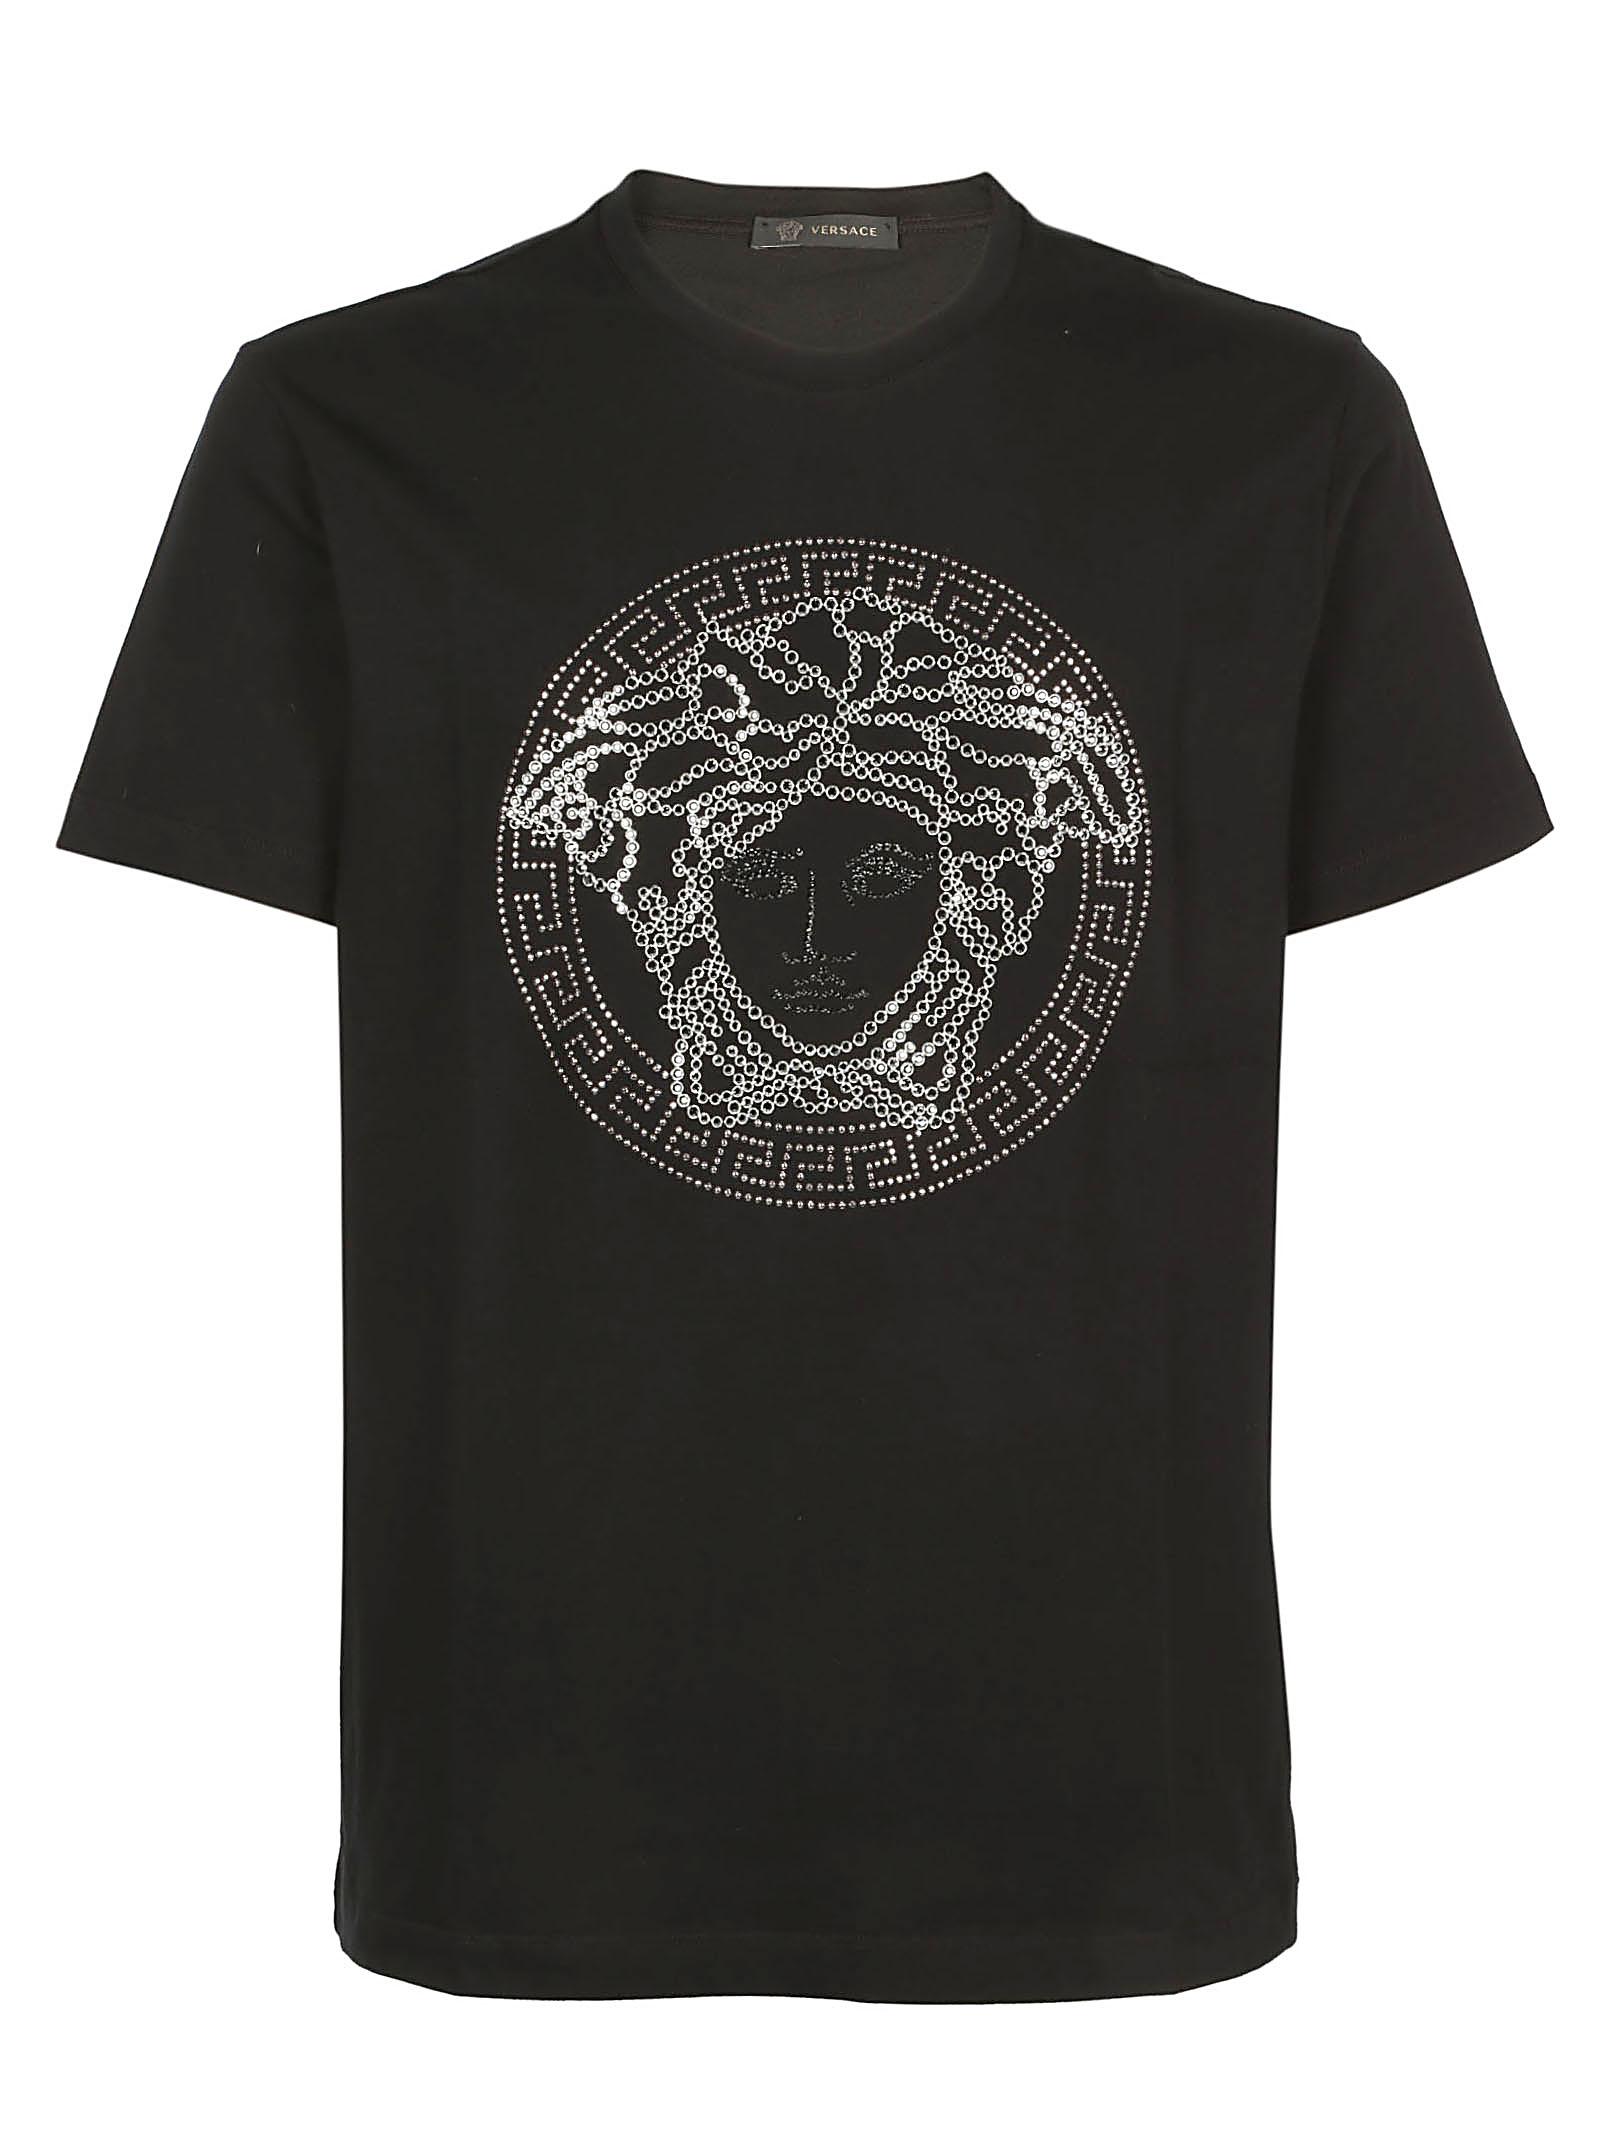 53688f30 Versace Men's Medusa Head Graphic T-Shirt, Black | ModeSens